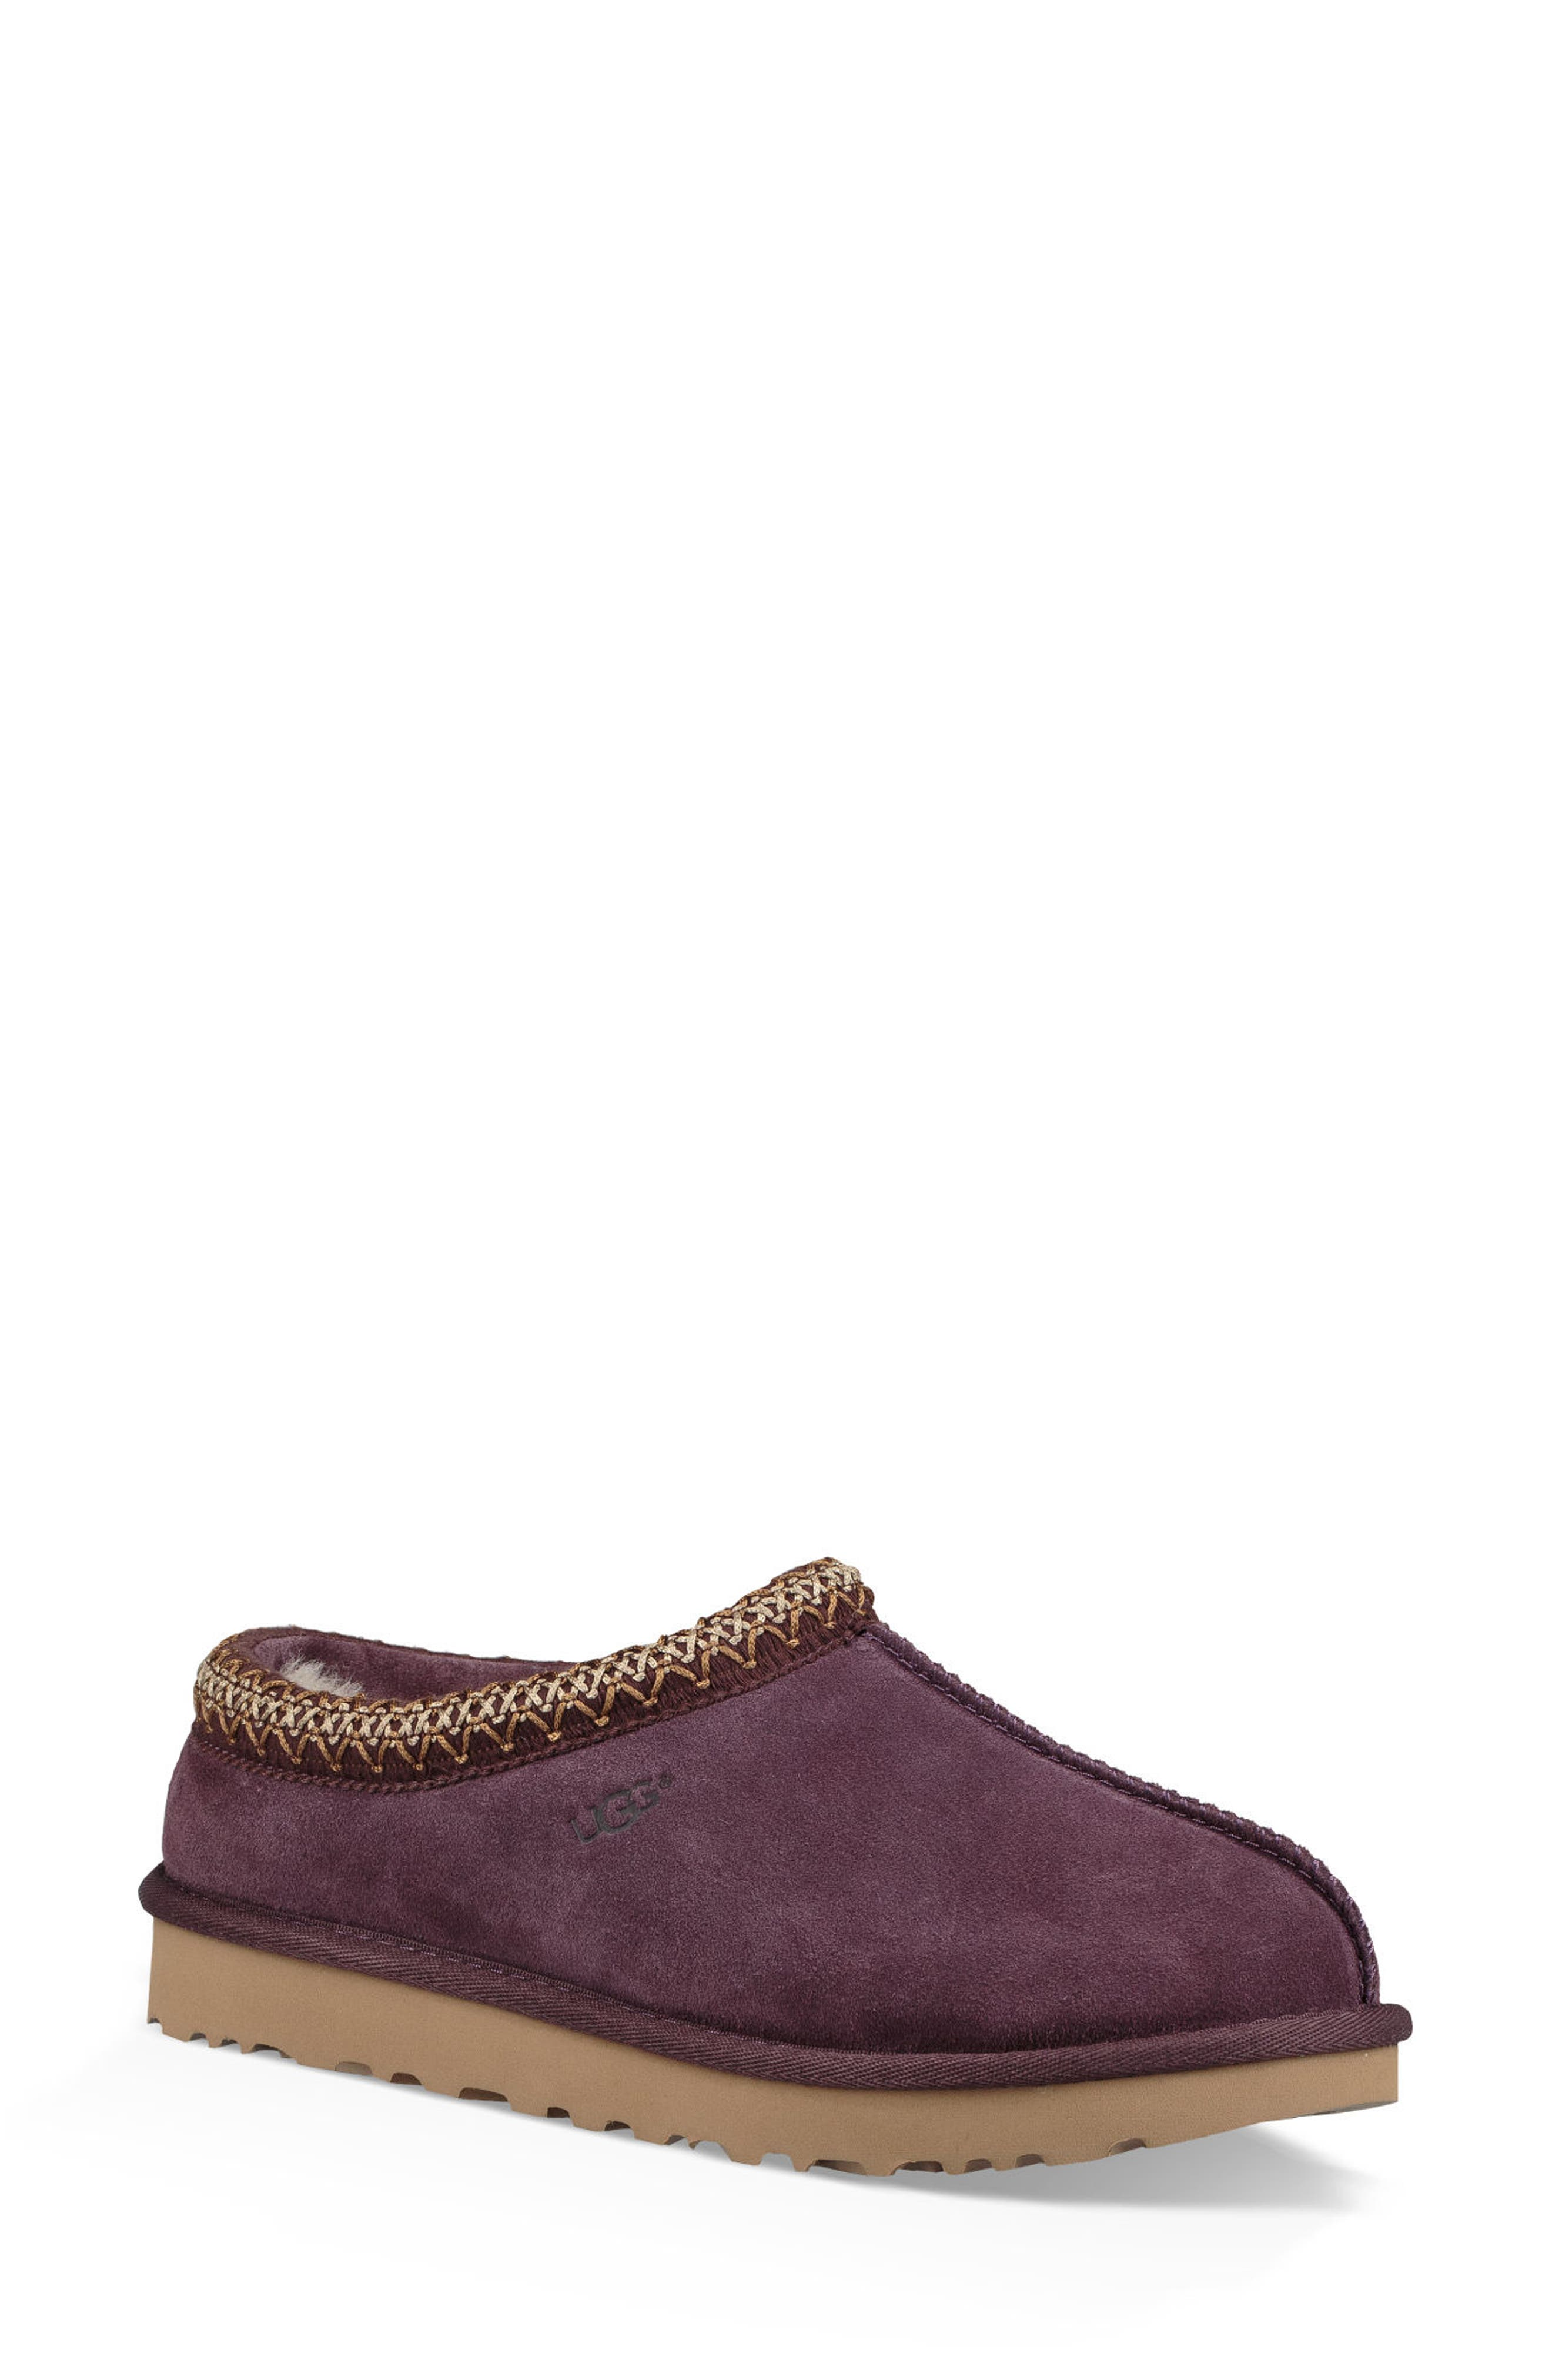 'Tasman' Slipper,                         Main,                         color, Port Leather